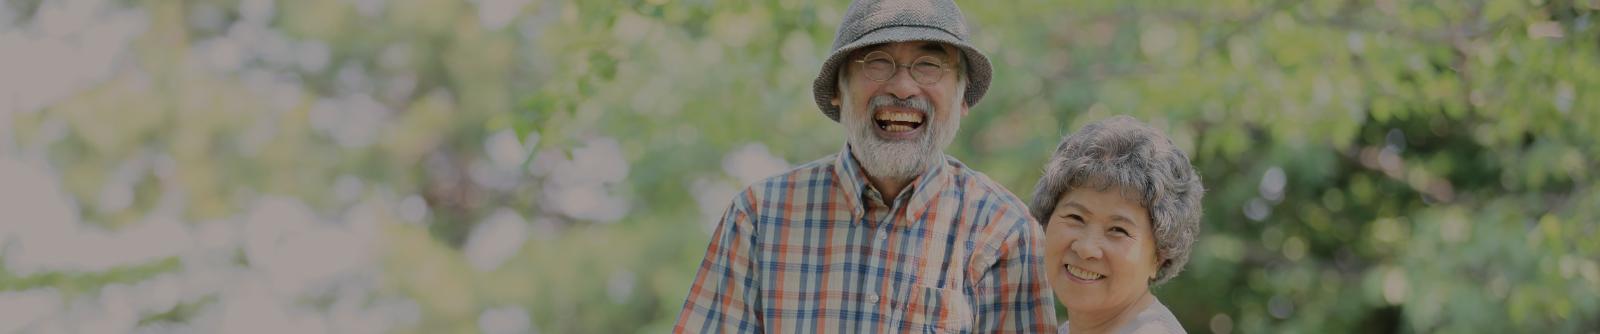 KMC 熊本 高齢者サポート